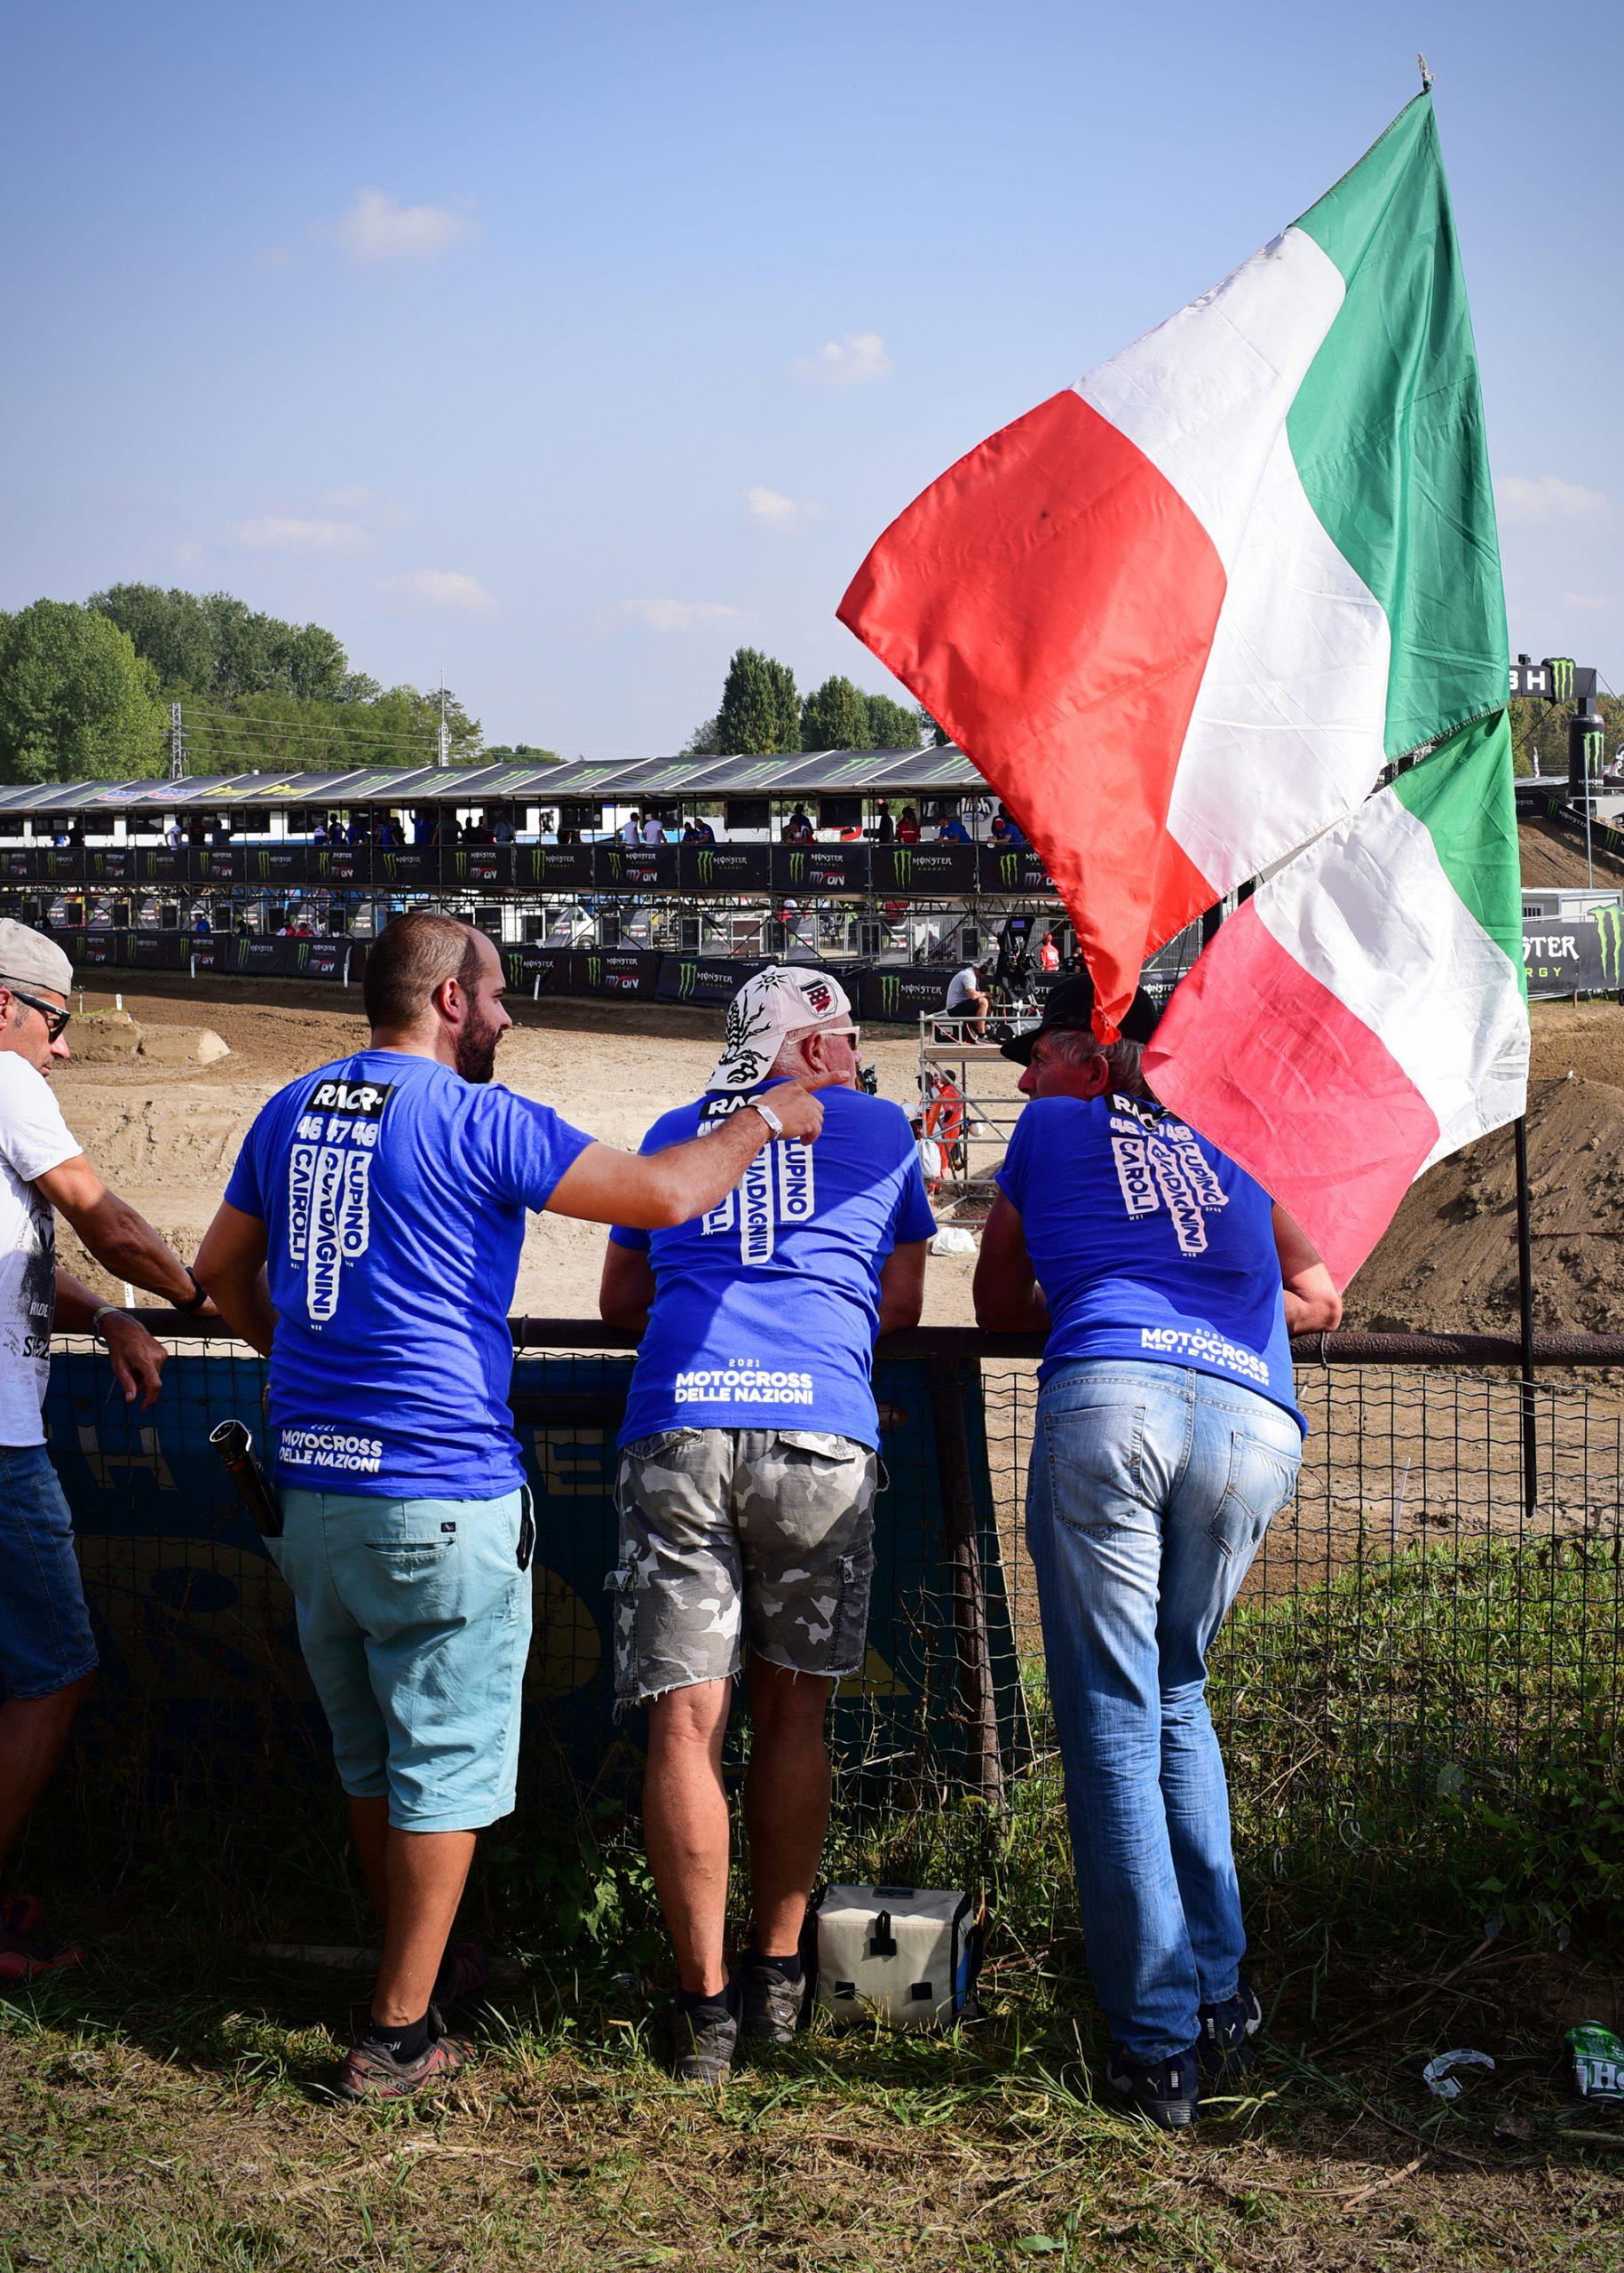 Italian Moto Fans at Mantova